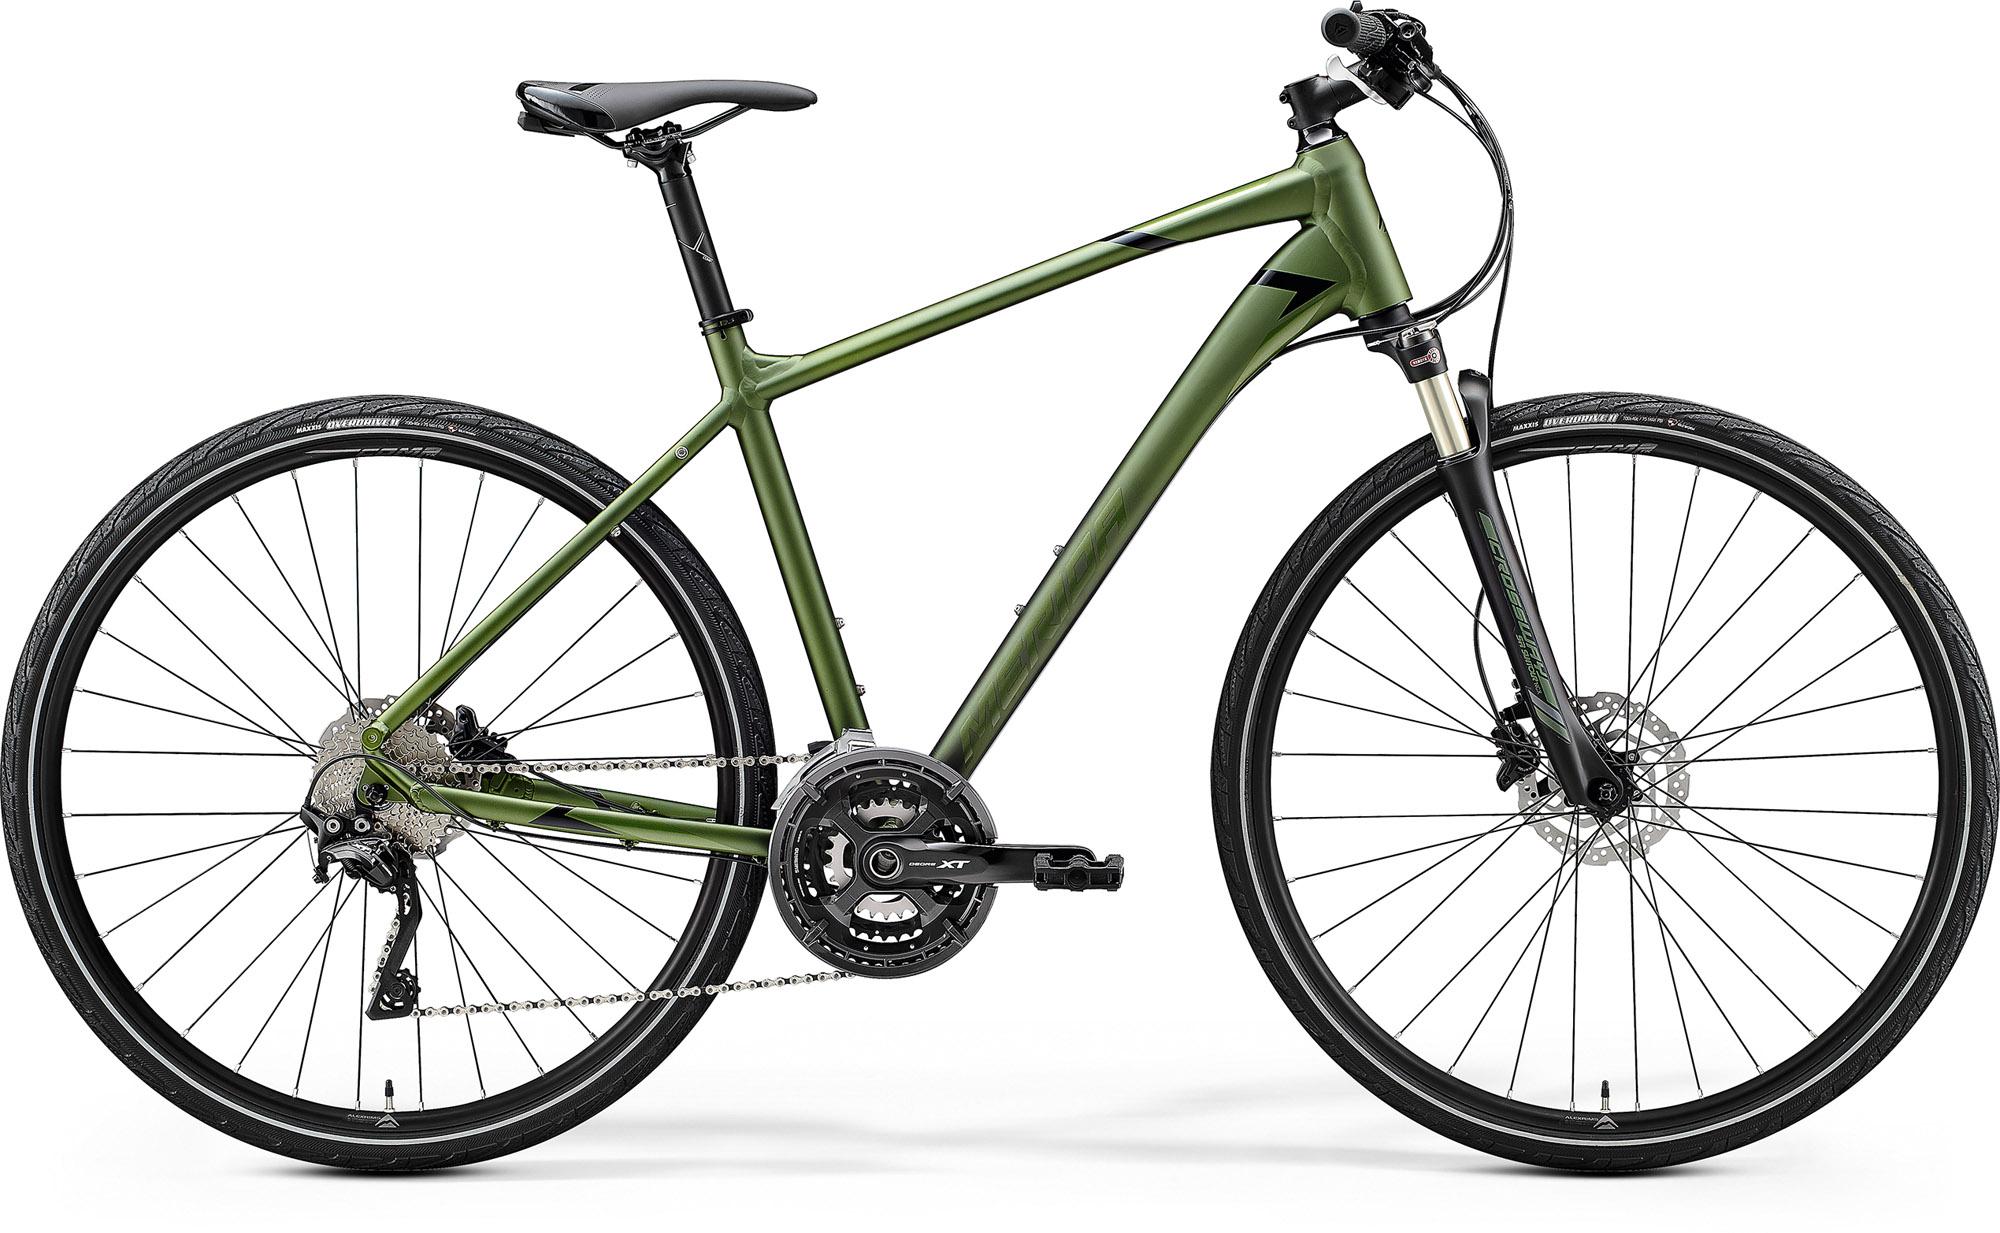 Bicicleta de trekking pentru Barbati Merida Crossway XT-Edition Mat Verde Inchis (Negru) 2020 imagine